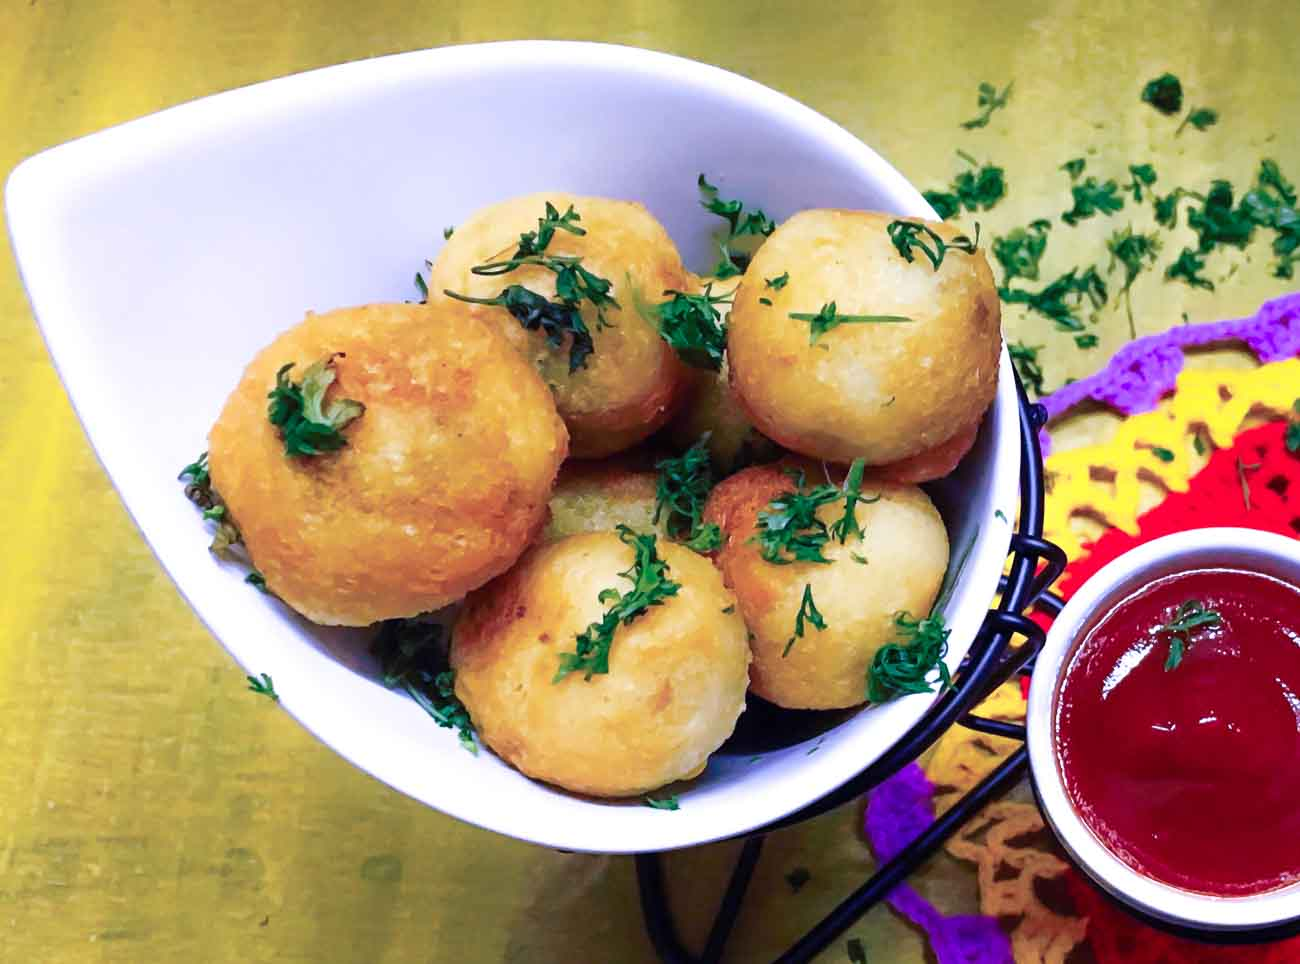 Bread Batata Vada Recipe-Crispy Bread Bonda Stuffed With Spicy Aloo